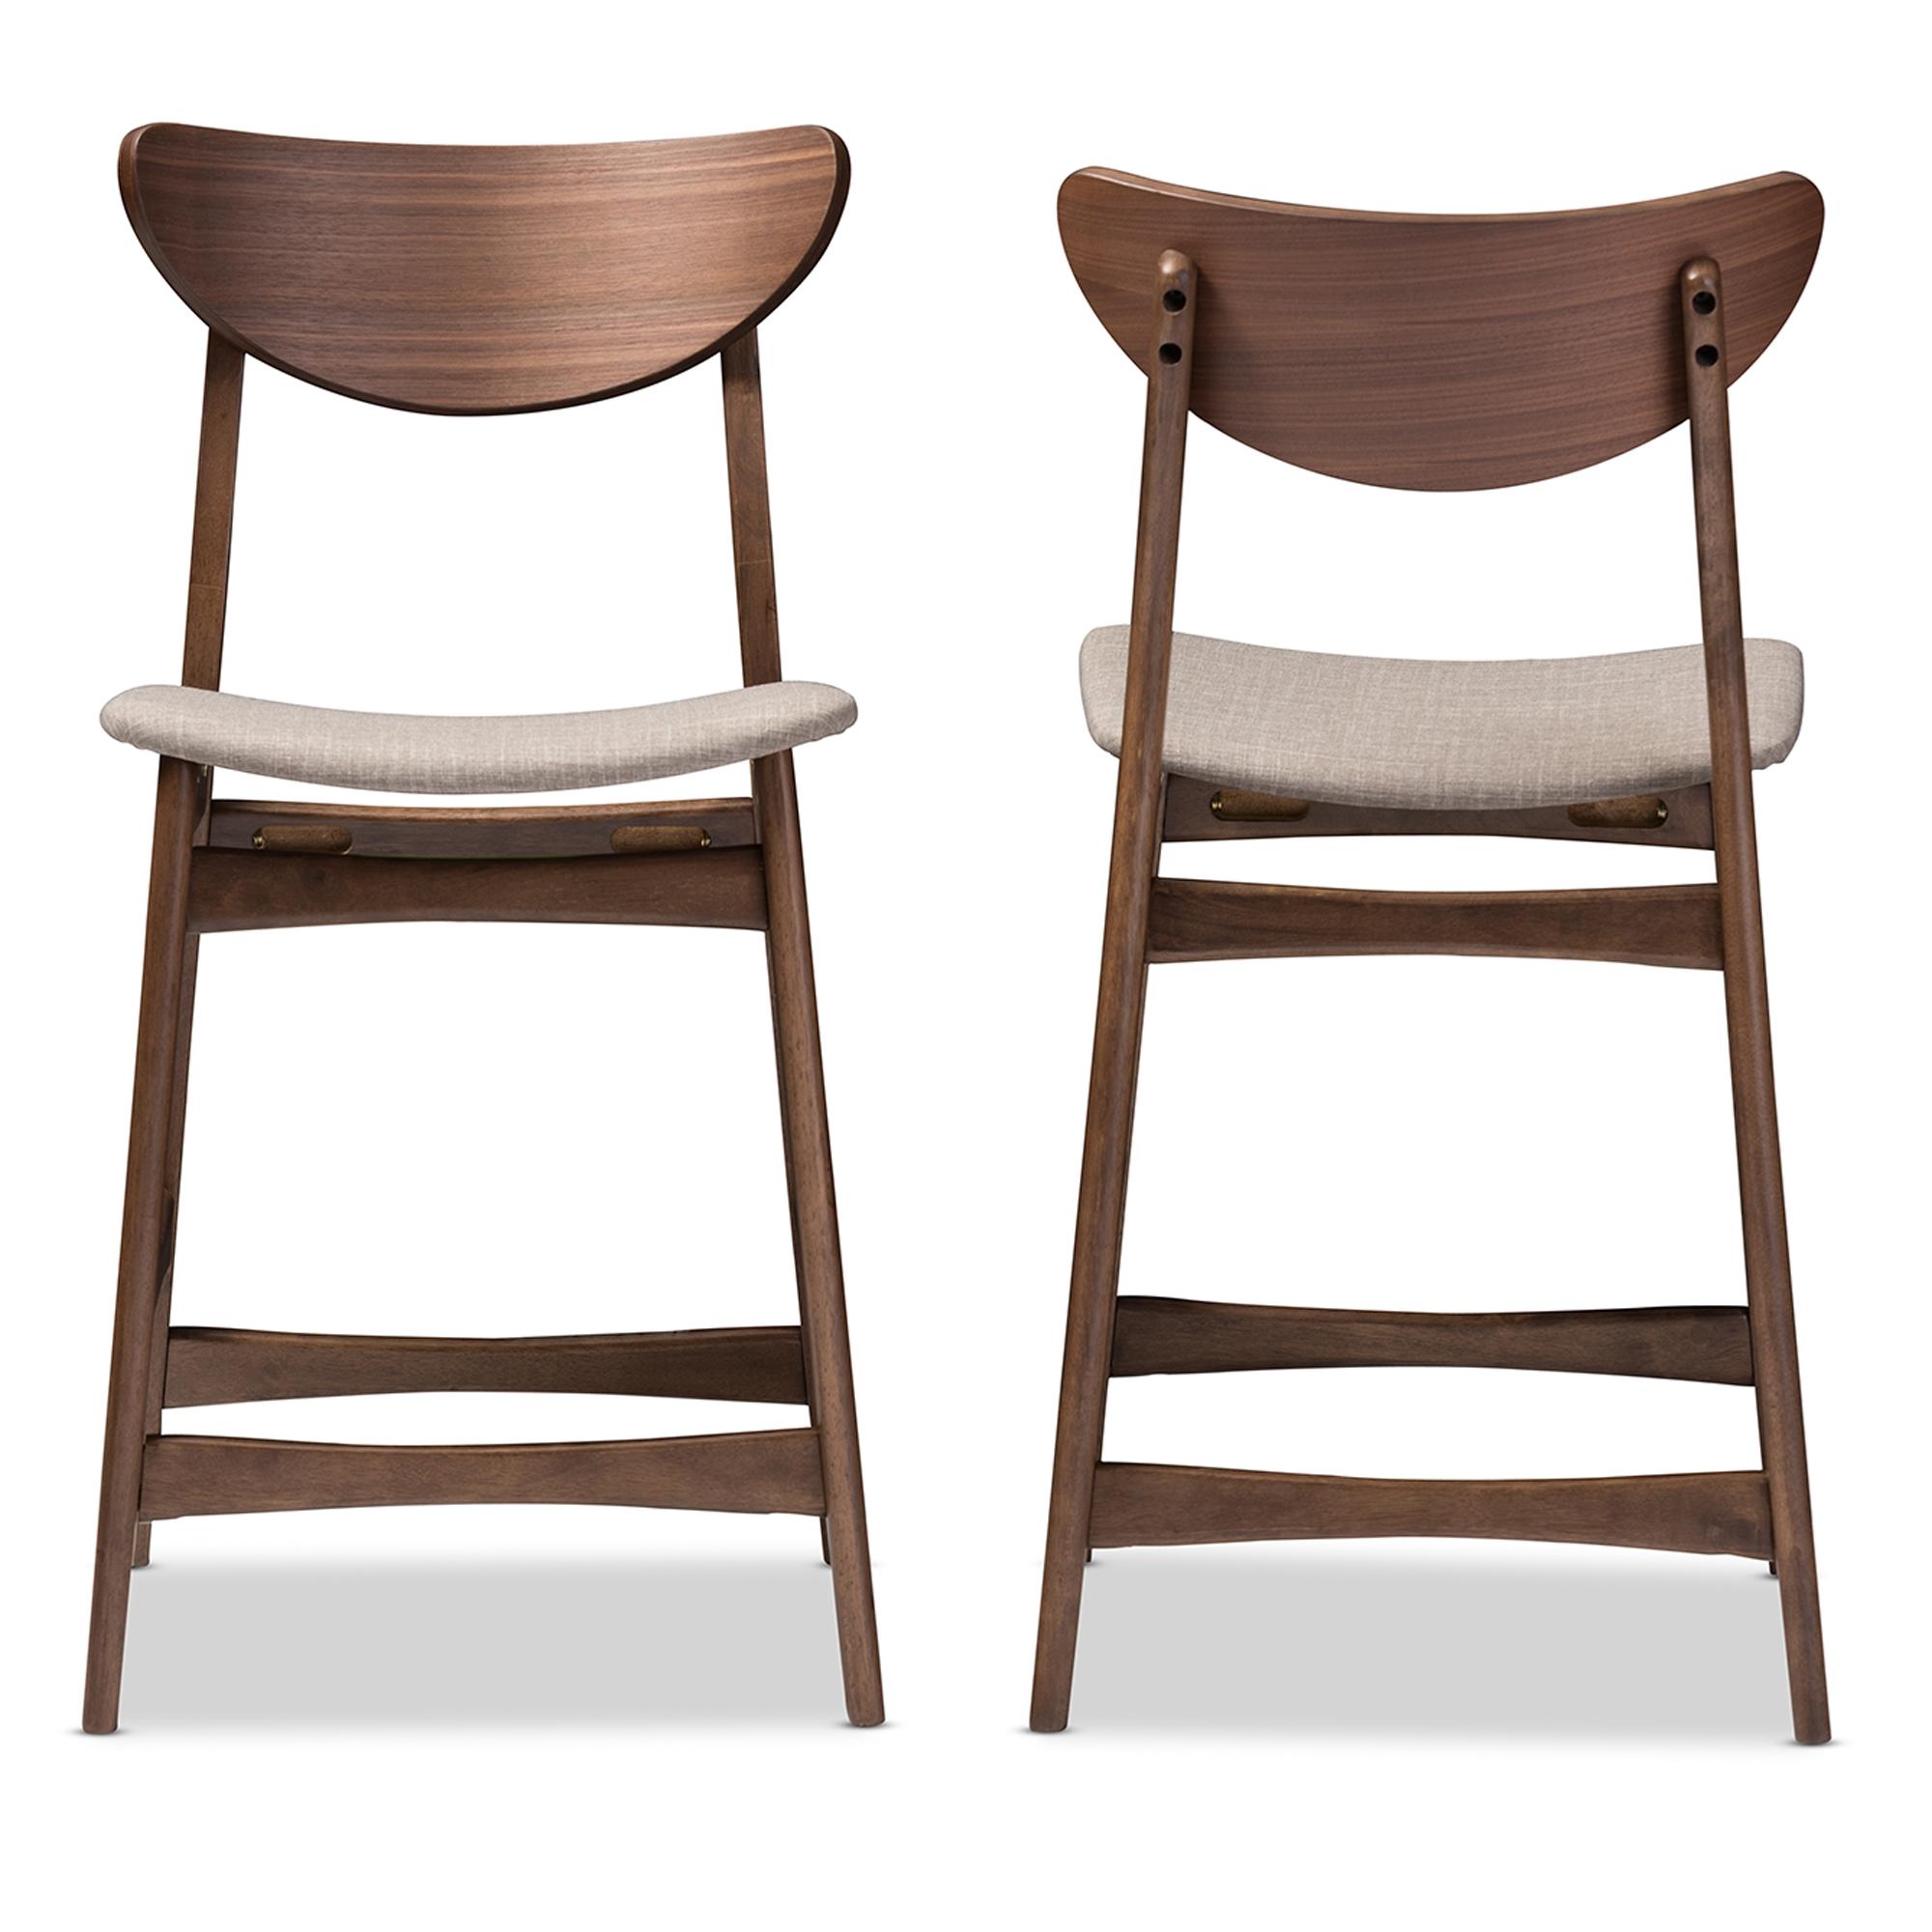 Baxton Studio Latina Mid Century Retro Modern Scandinavian Style Light Grey  Fabric Upholstered Walnut Wood